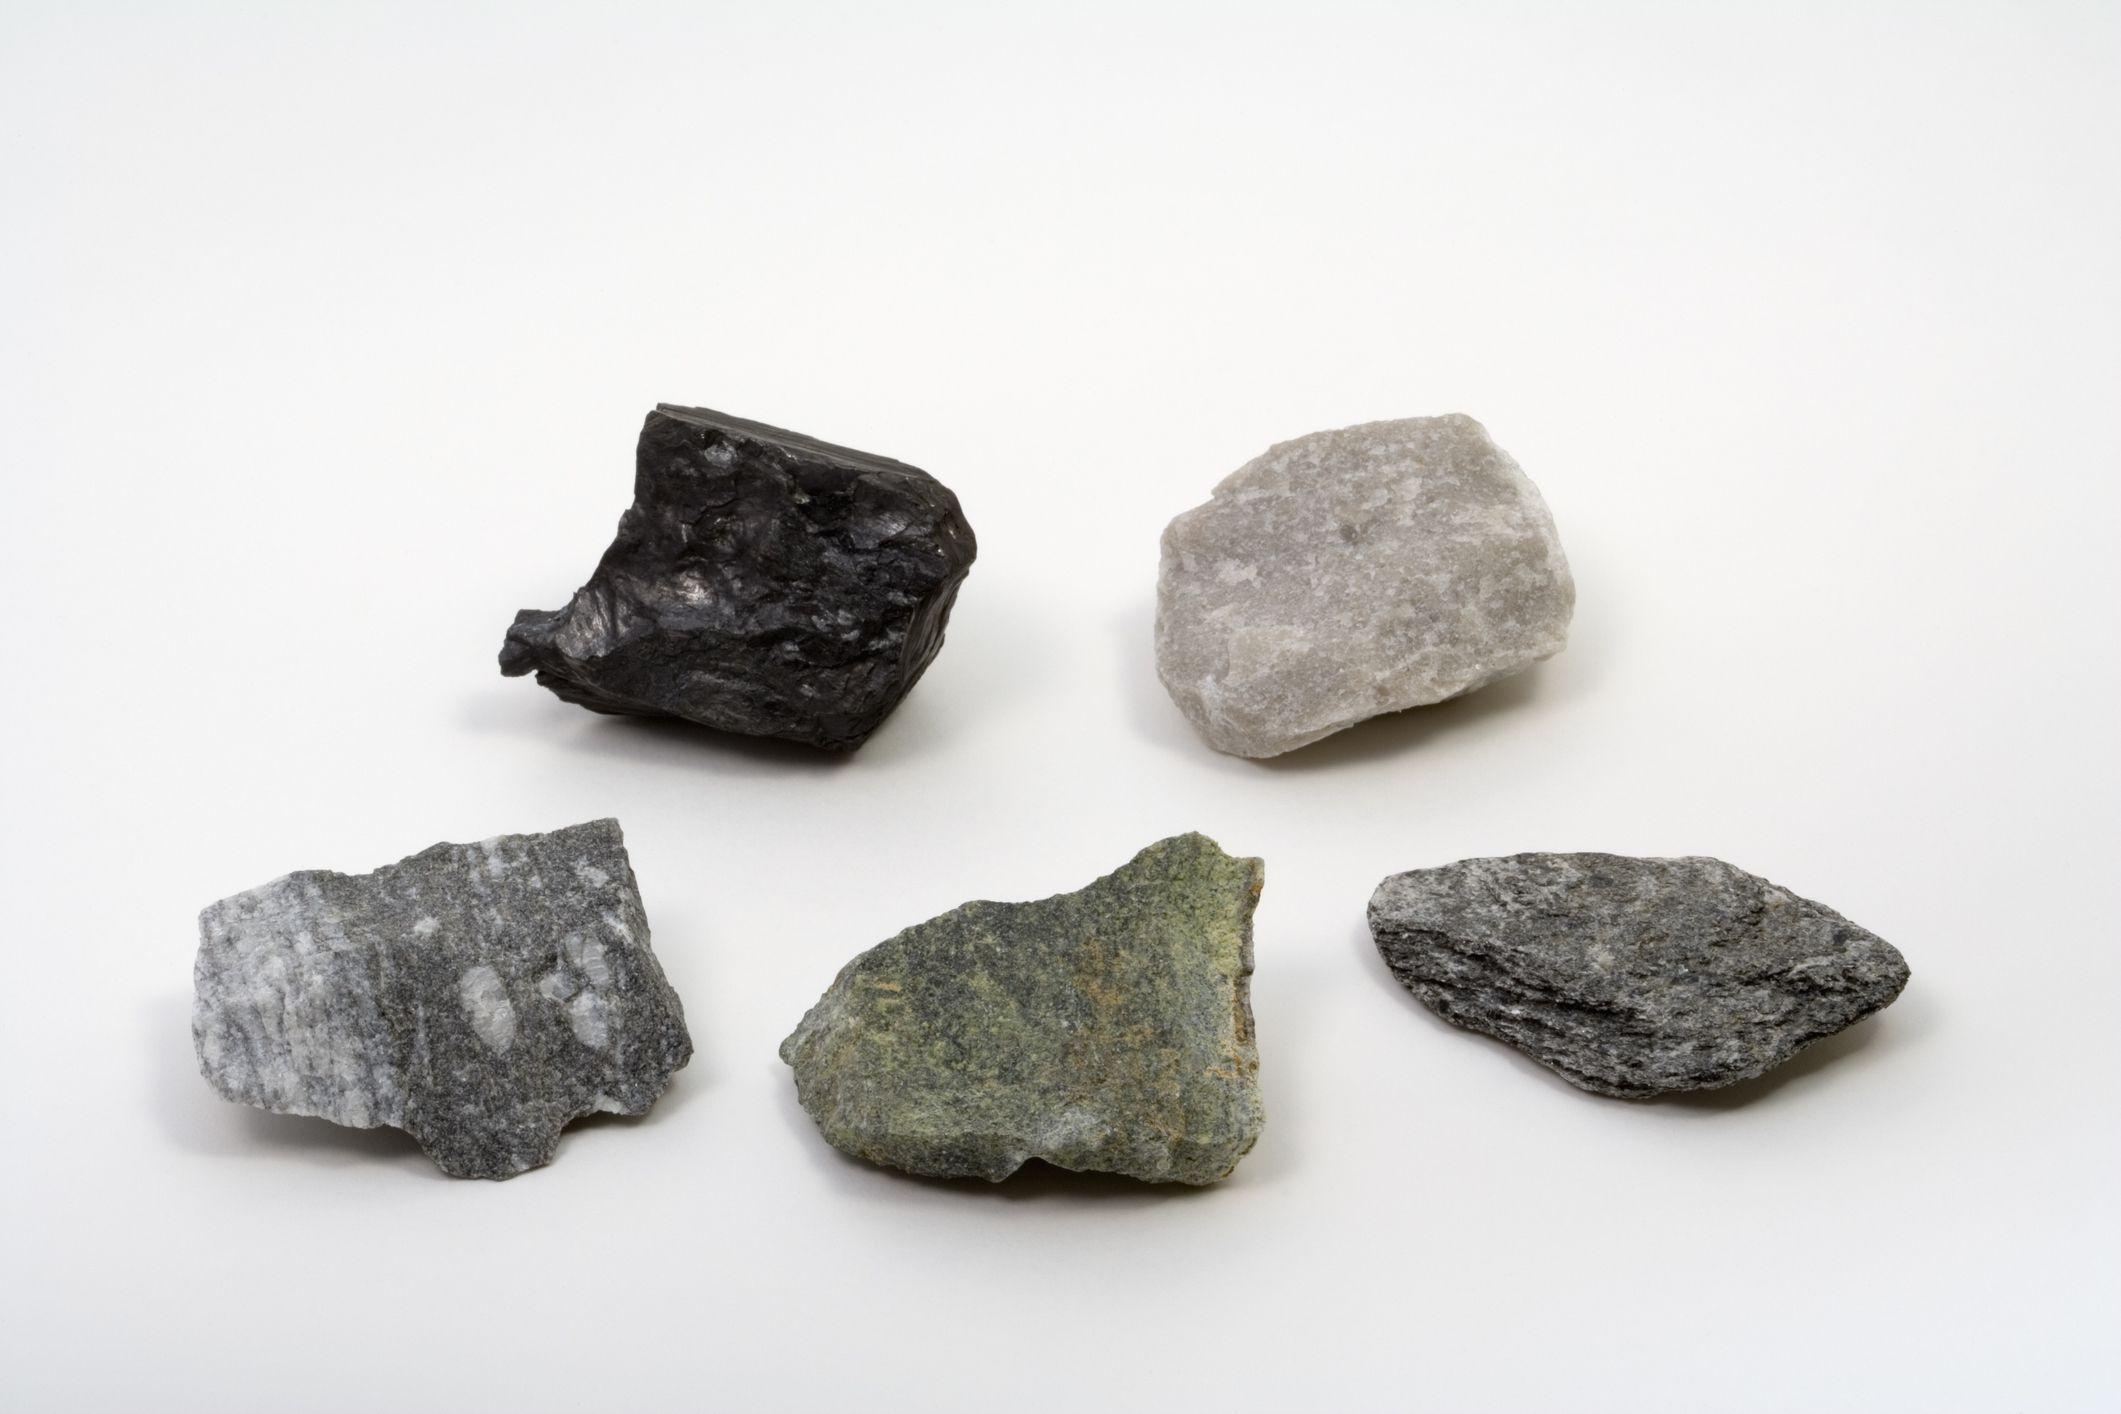 Metamorphic Rock Types: Pictures and Descriptions